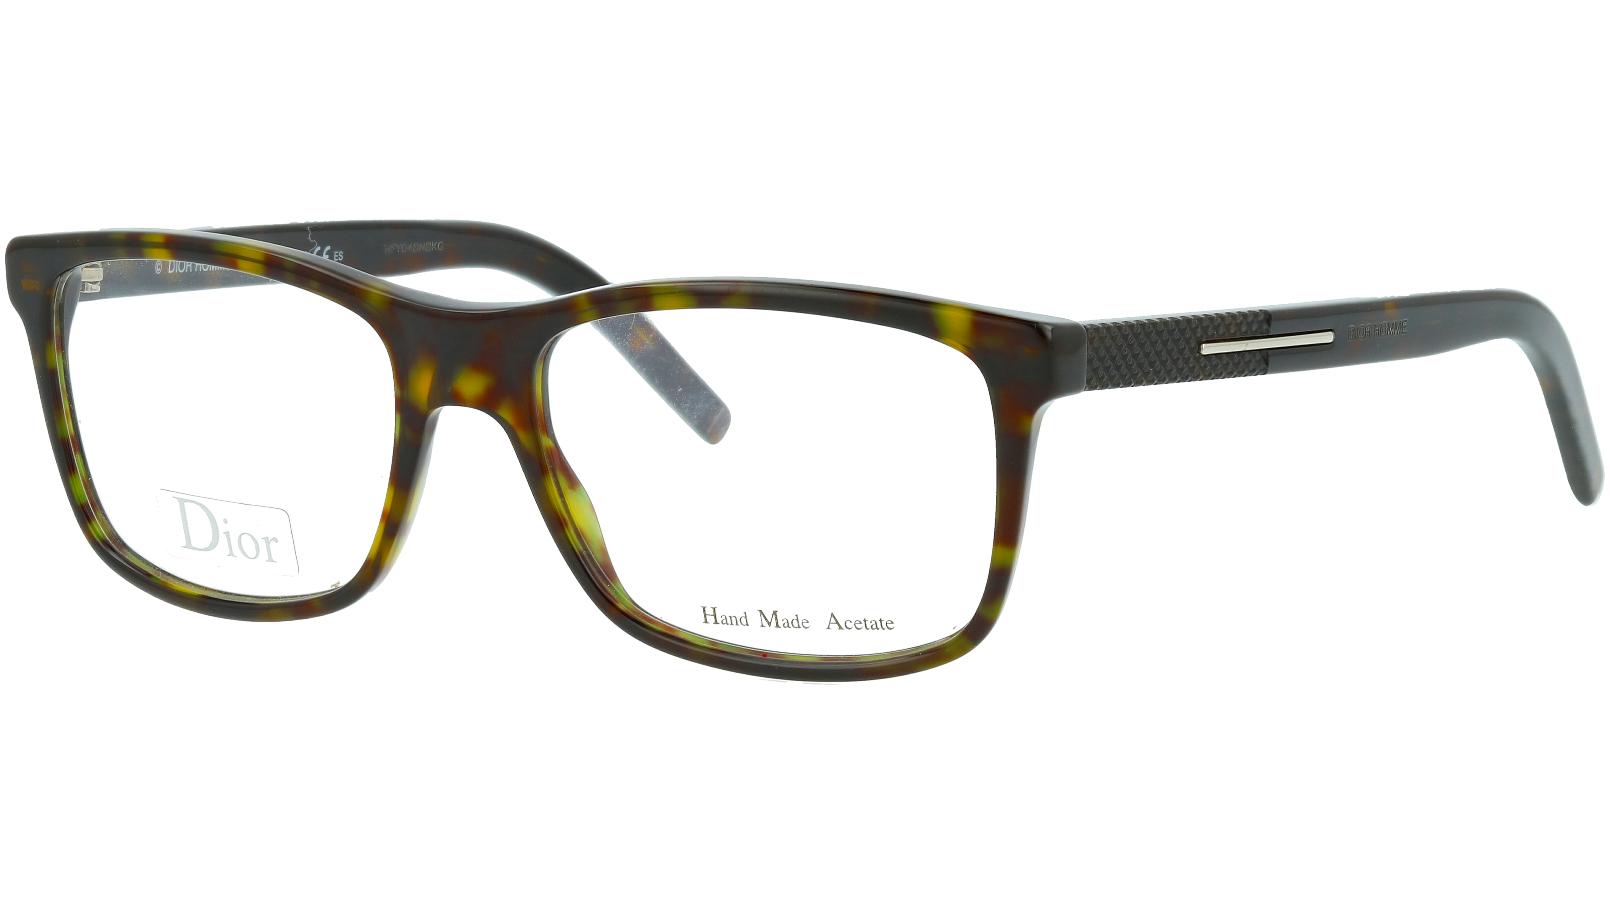 Dior HOMME BlackTIE140 086 53 Havana Glasses